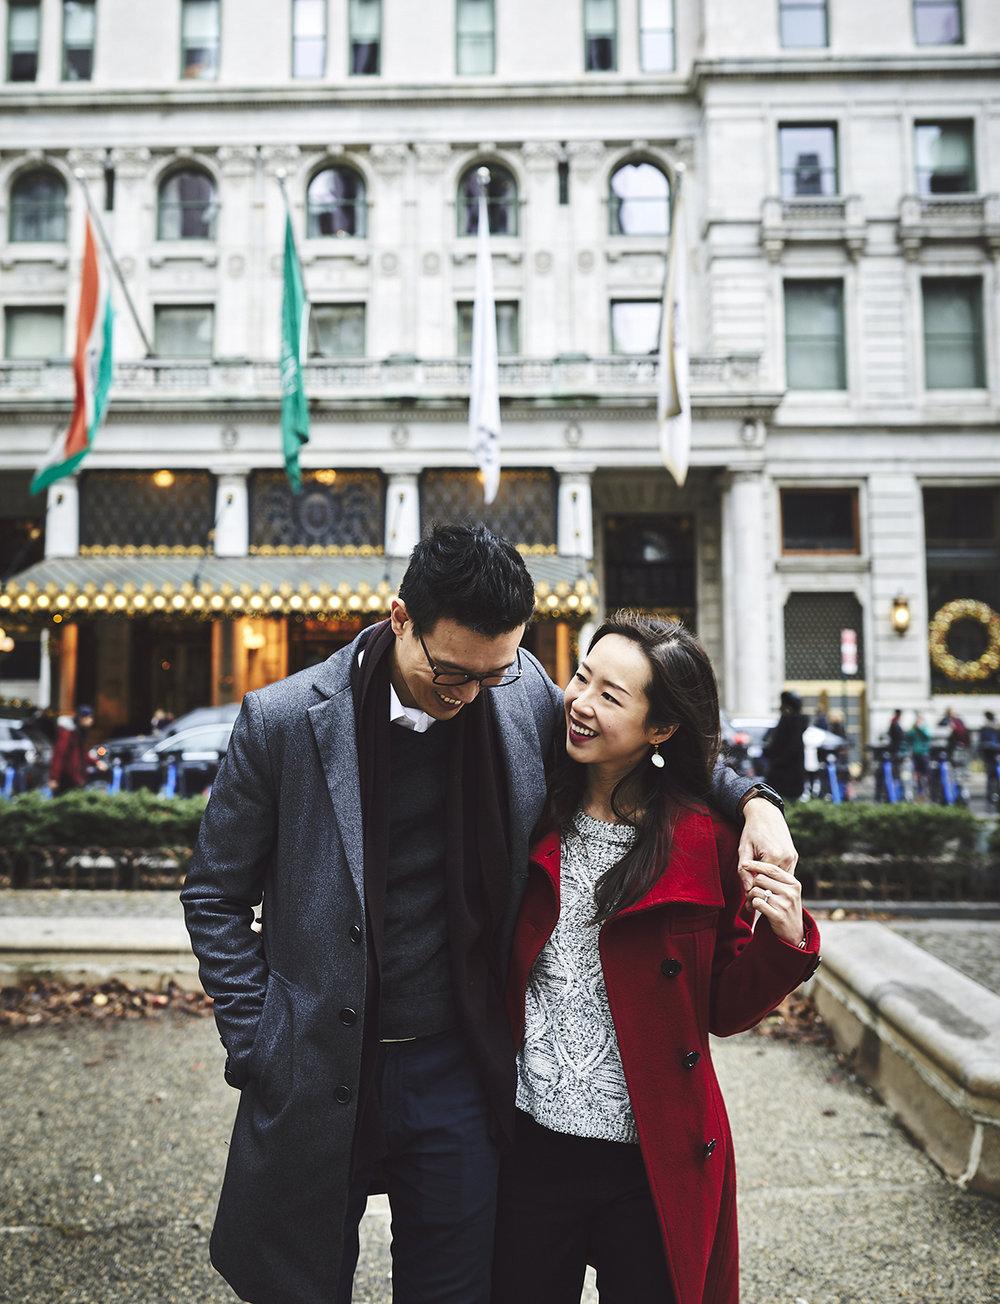 171212_NYCEngagementPhotography_NYCengagementPhotographer_CentralParkEngagement_NYCHolidayPhotographer_by_BriJohnsonWeddings_0025.jpg